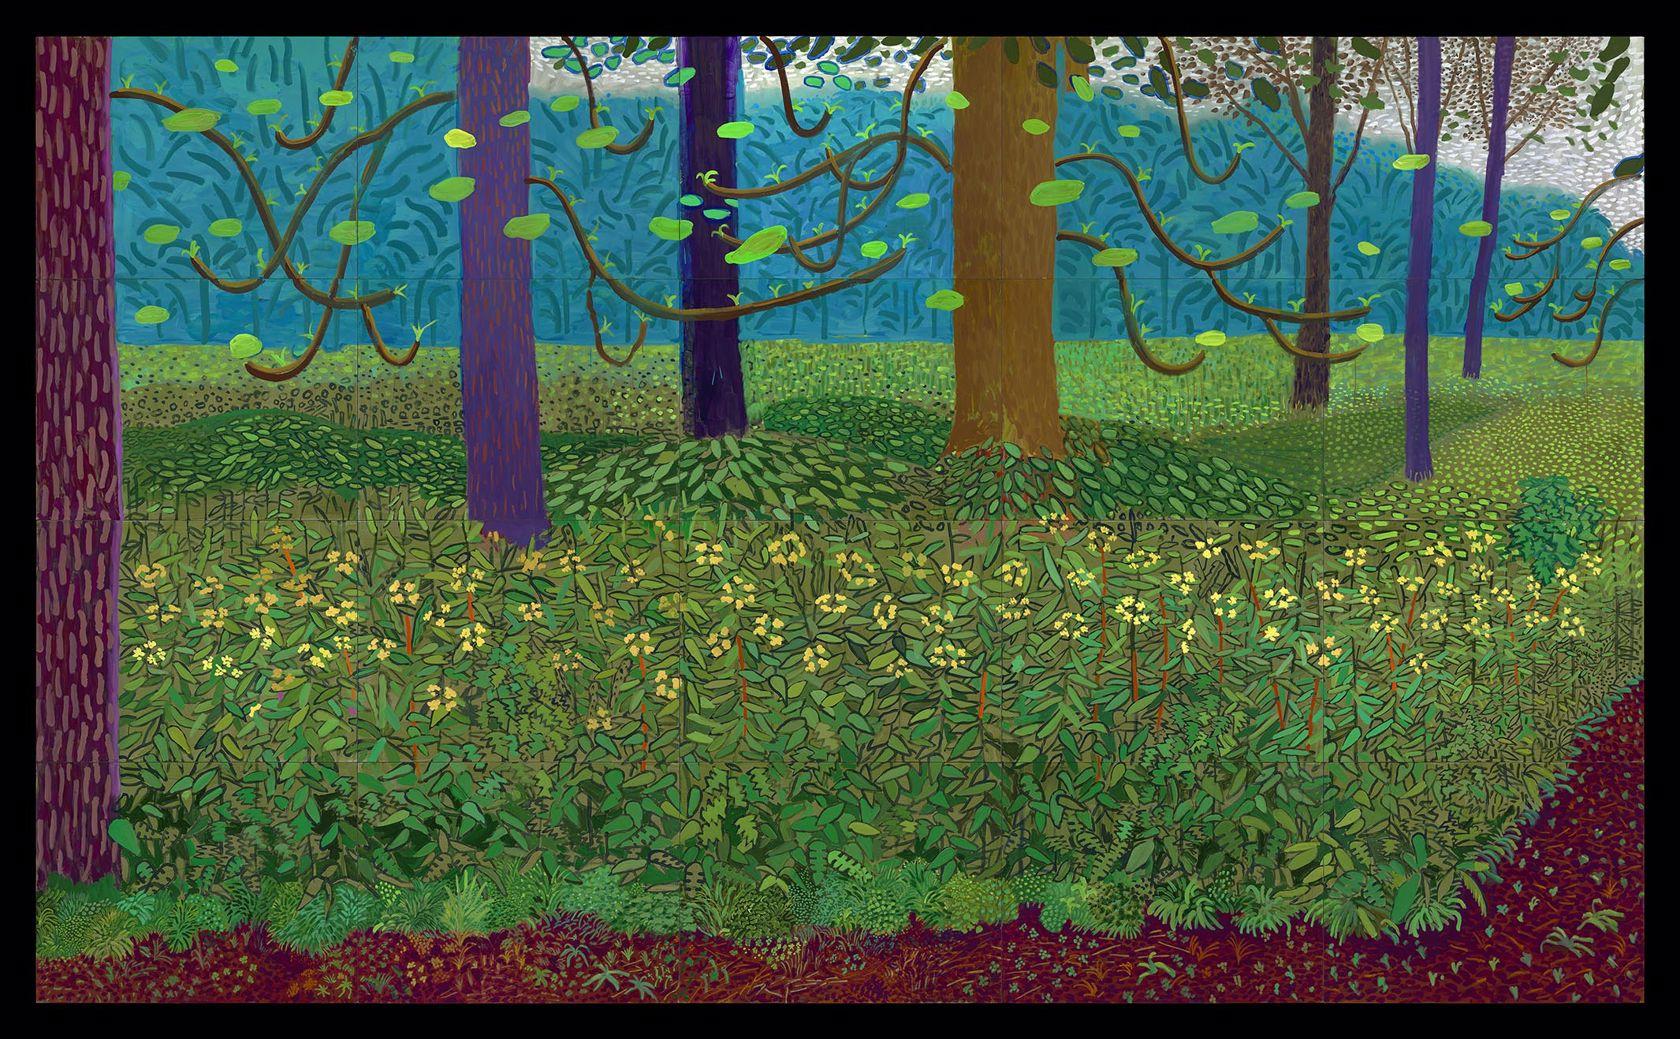 《更大的树下》(Under the Trees, Bigger),霍克尼